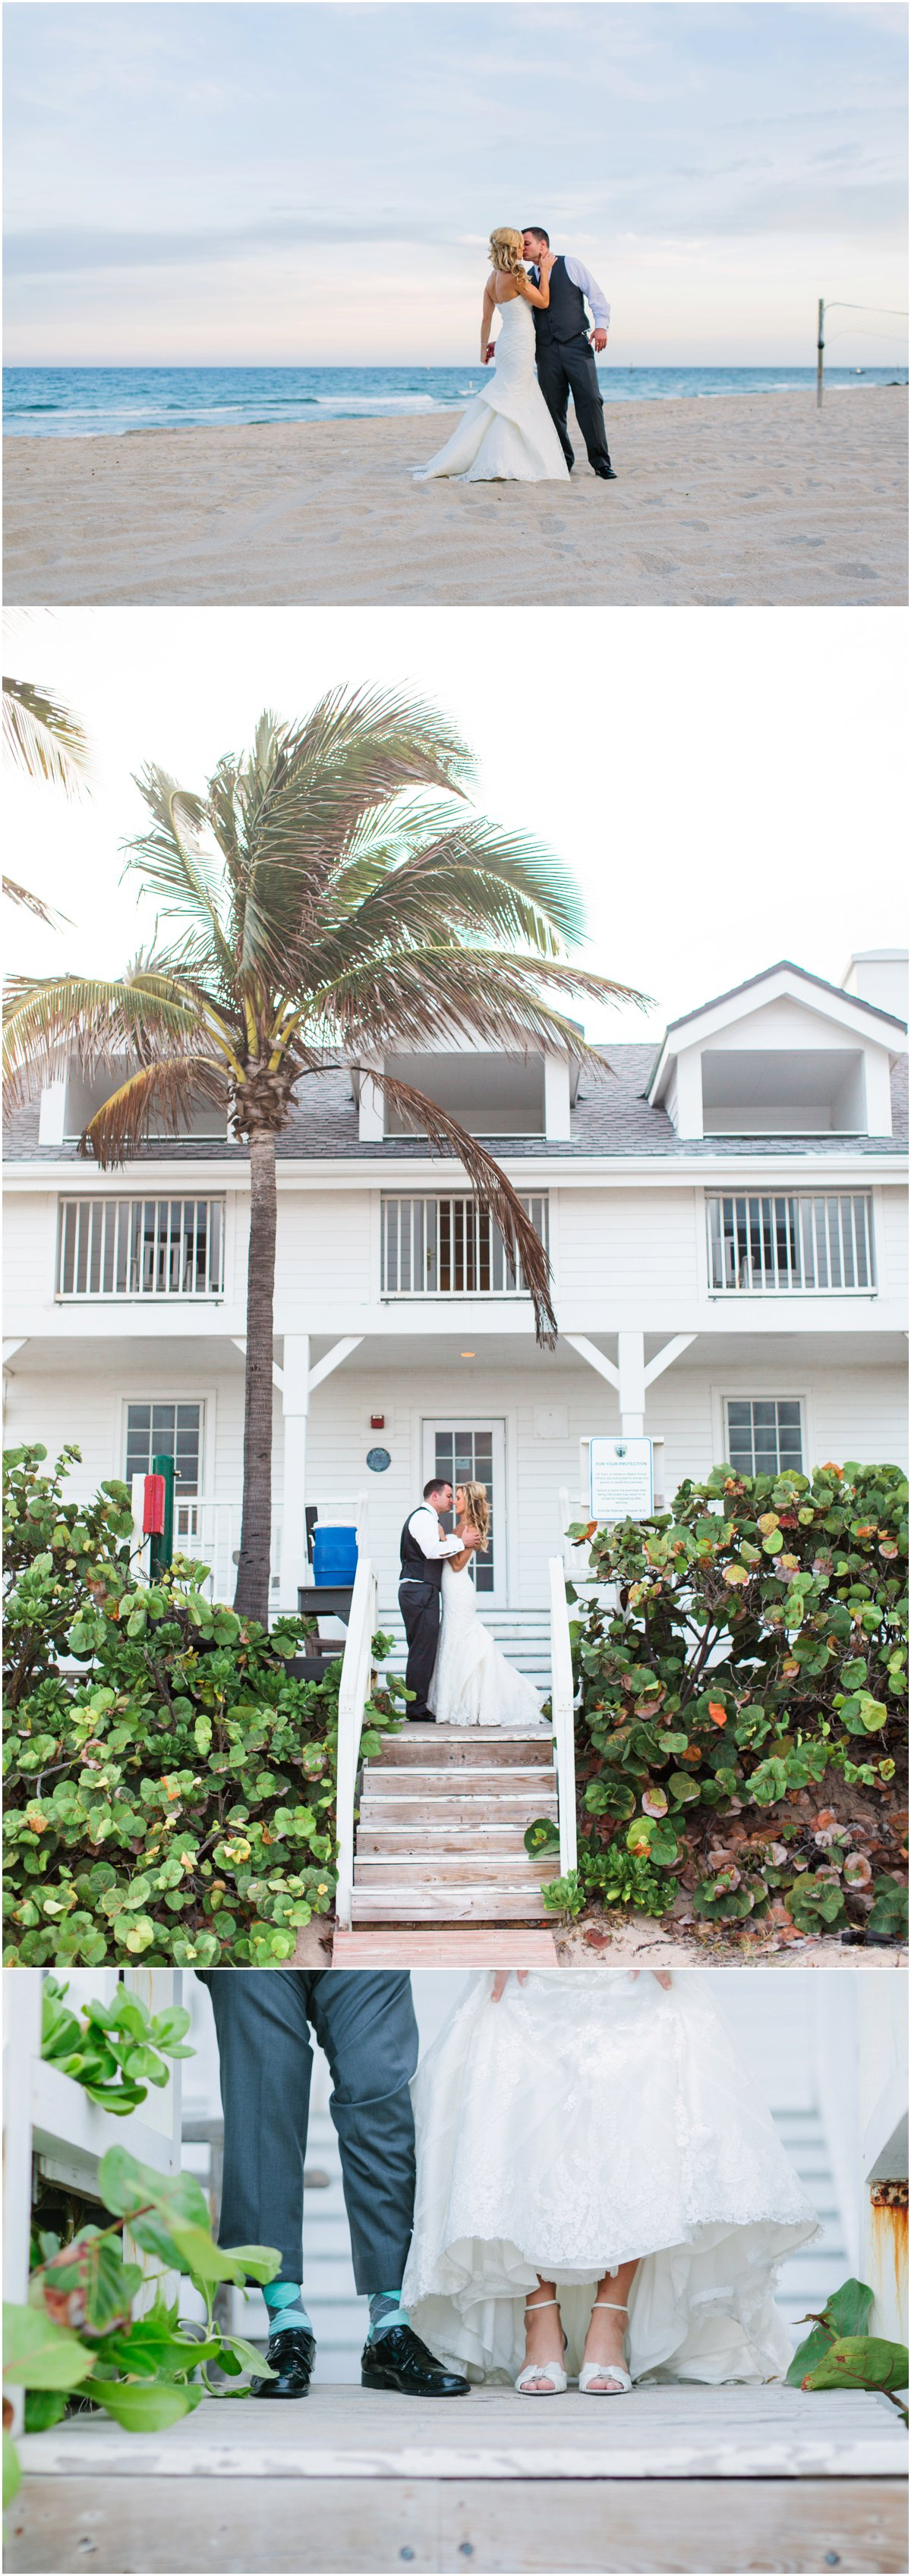 South-Florida-Wedding-Photographer-Hillsboro-lighthouse_0030